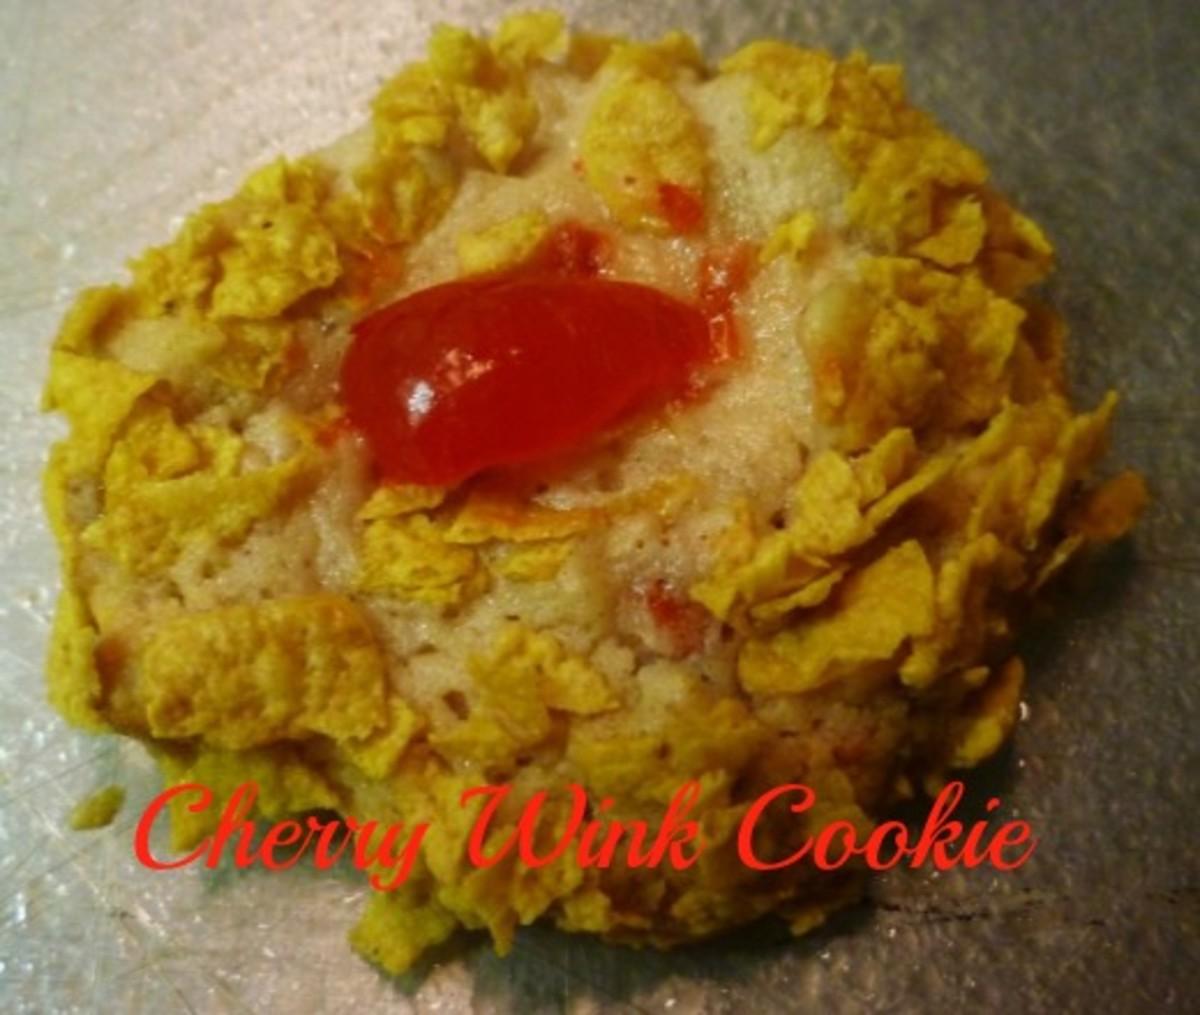 Homemade Cherry Wink Cookie